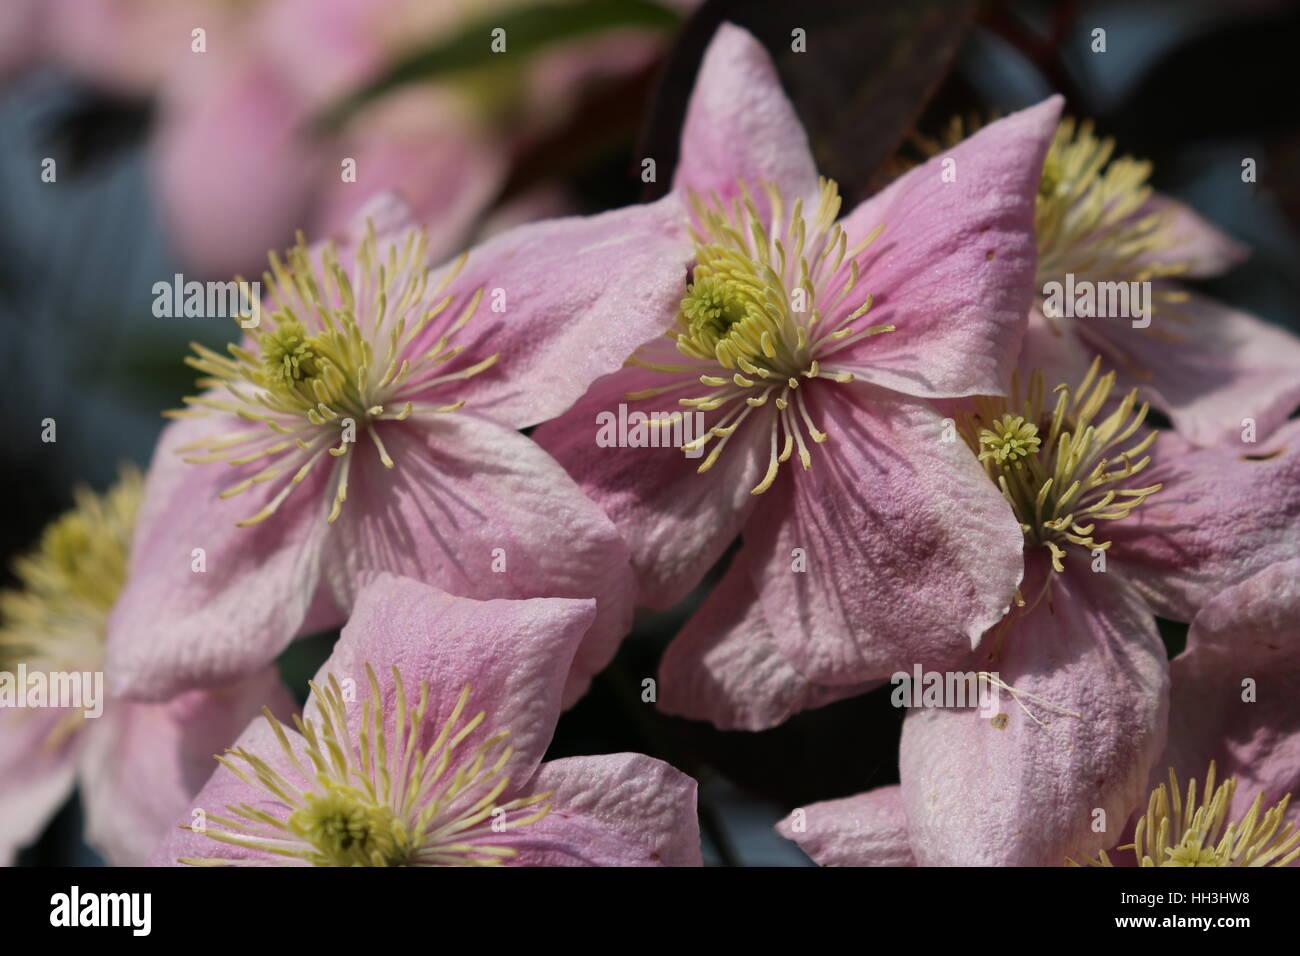 Rosa blühende Clematis - Stock Image